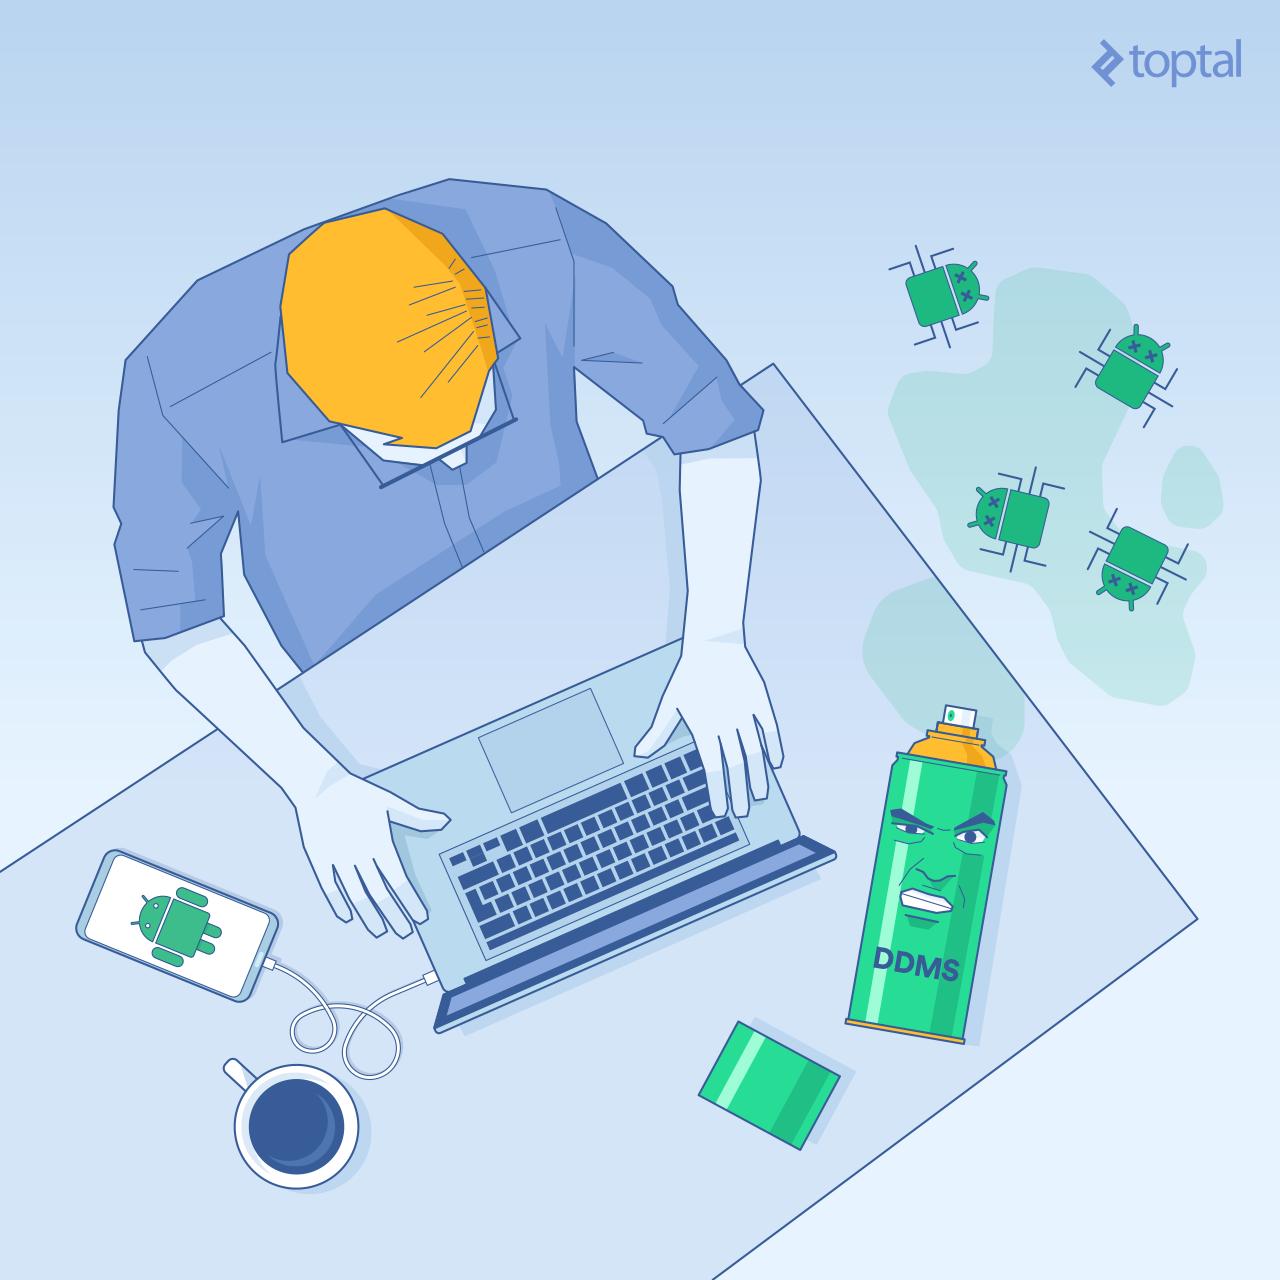 Android DDMS Cover Illustration: Developer debugging with DDMS.